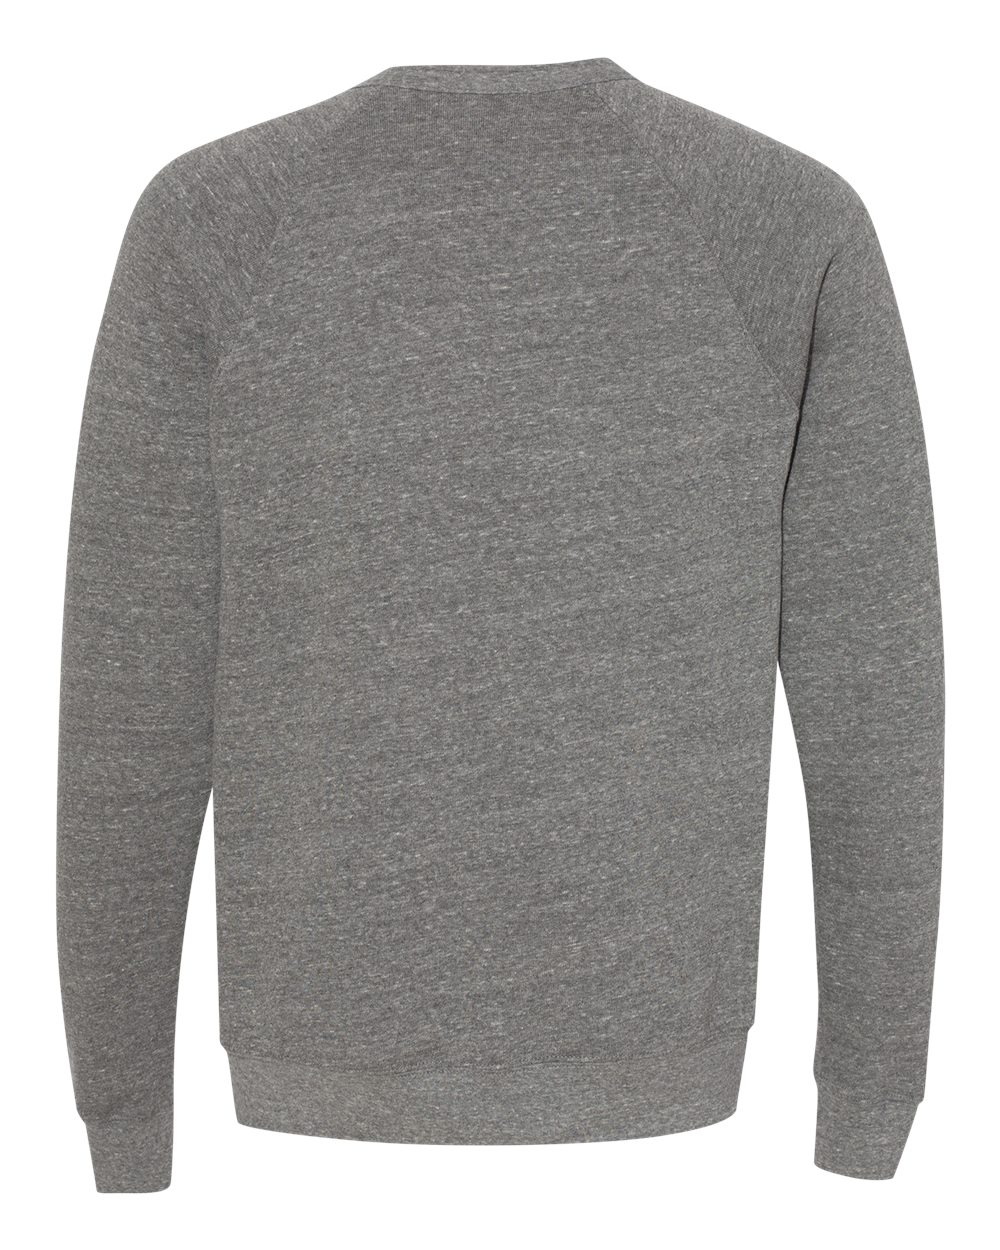 Bella-Canvas-Unisex-Sponge-Fleece-Crewneck-Sweatshirt-Top-Blank-3901-up-to-2XL thumbnail 25